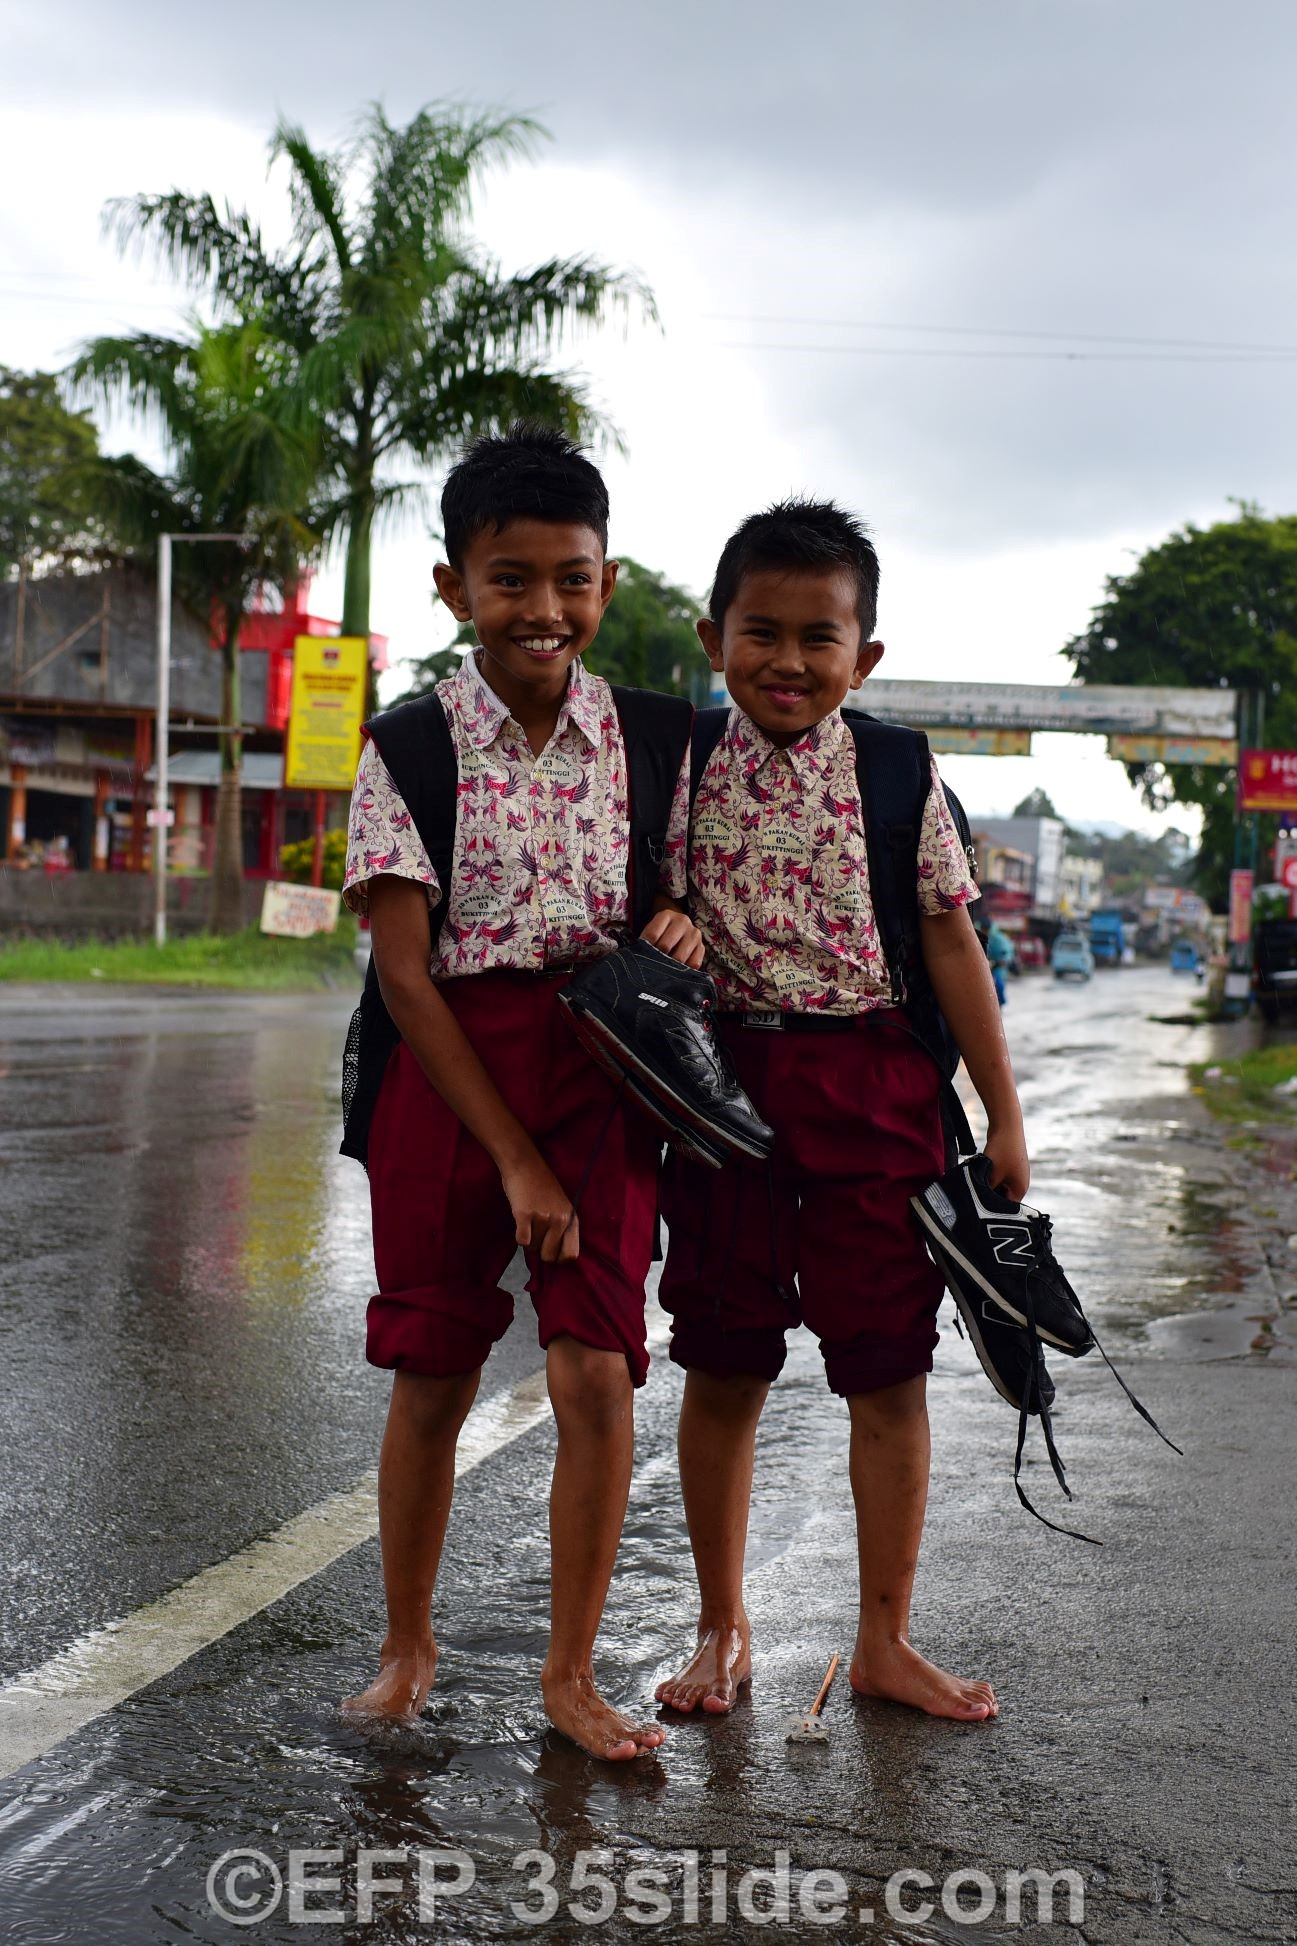 Rainy School Day Sumatra.jpg